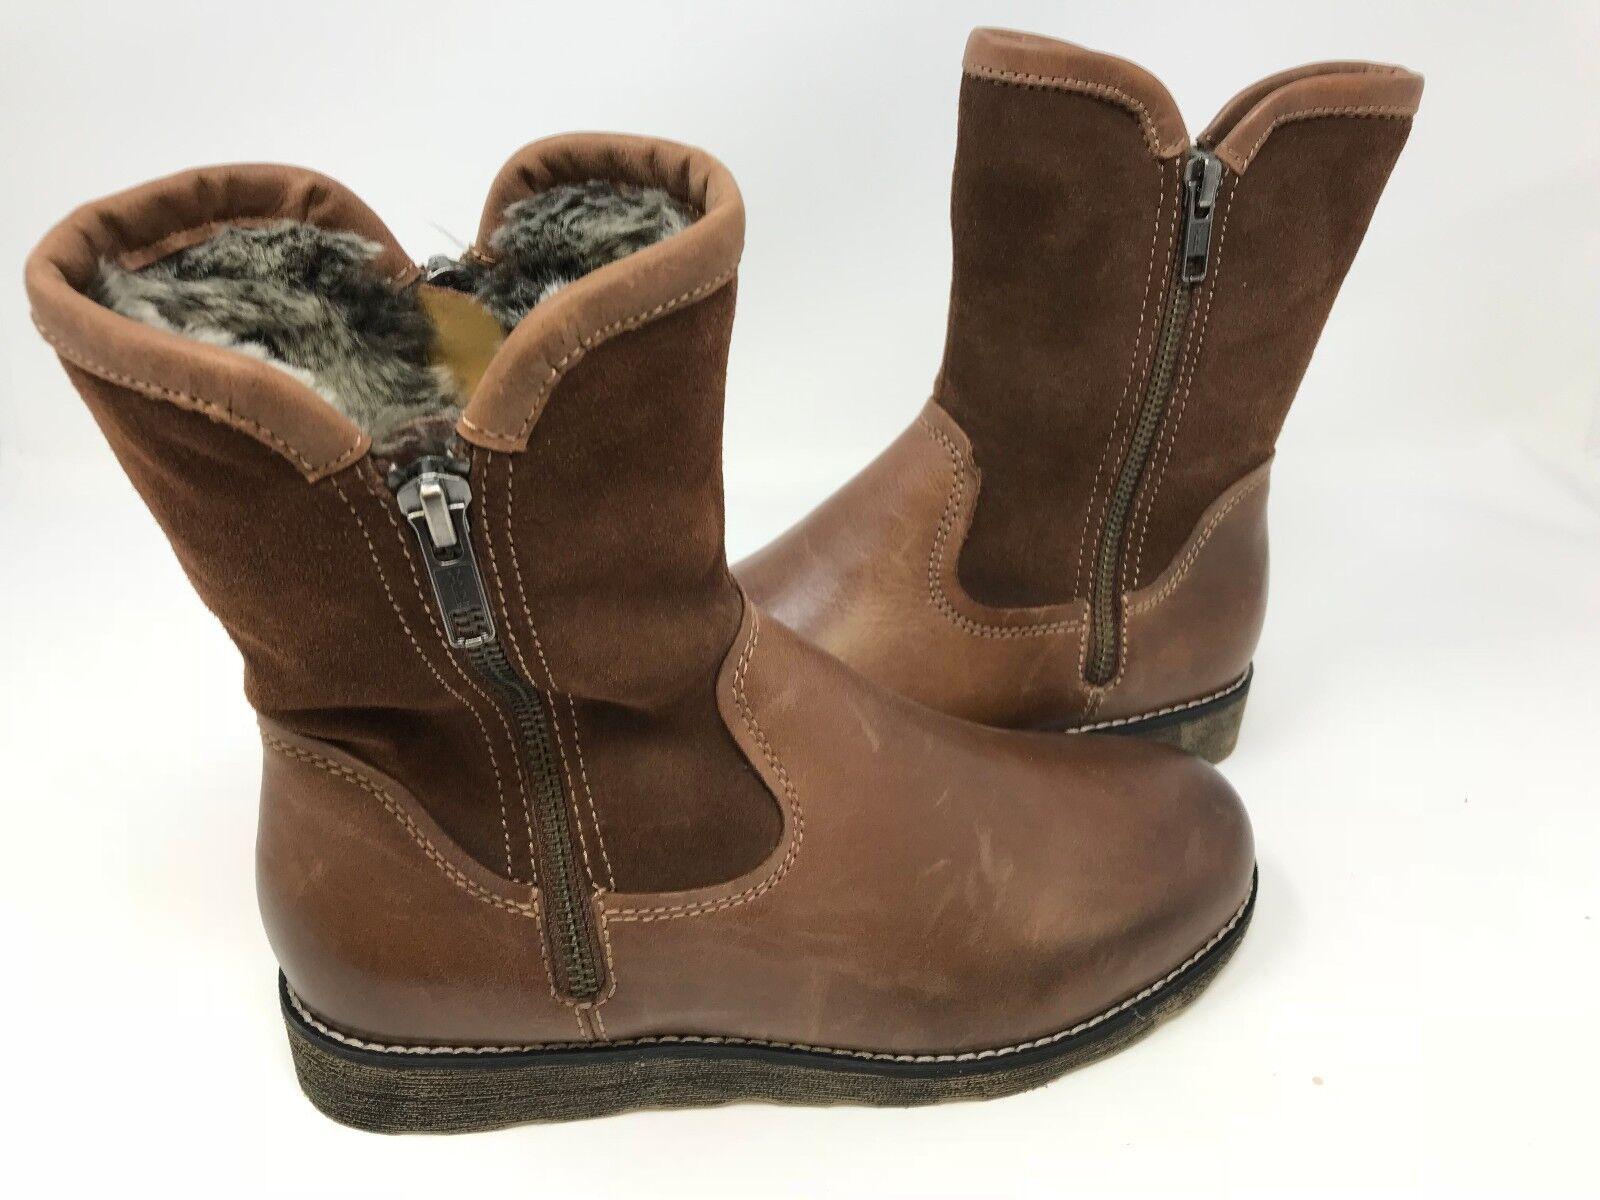 a9737dacdd7 NEW! Eastland Women s Gabriella Boots localjoes-20133 Brown Boots ...